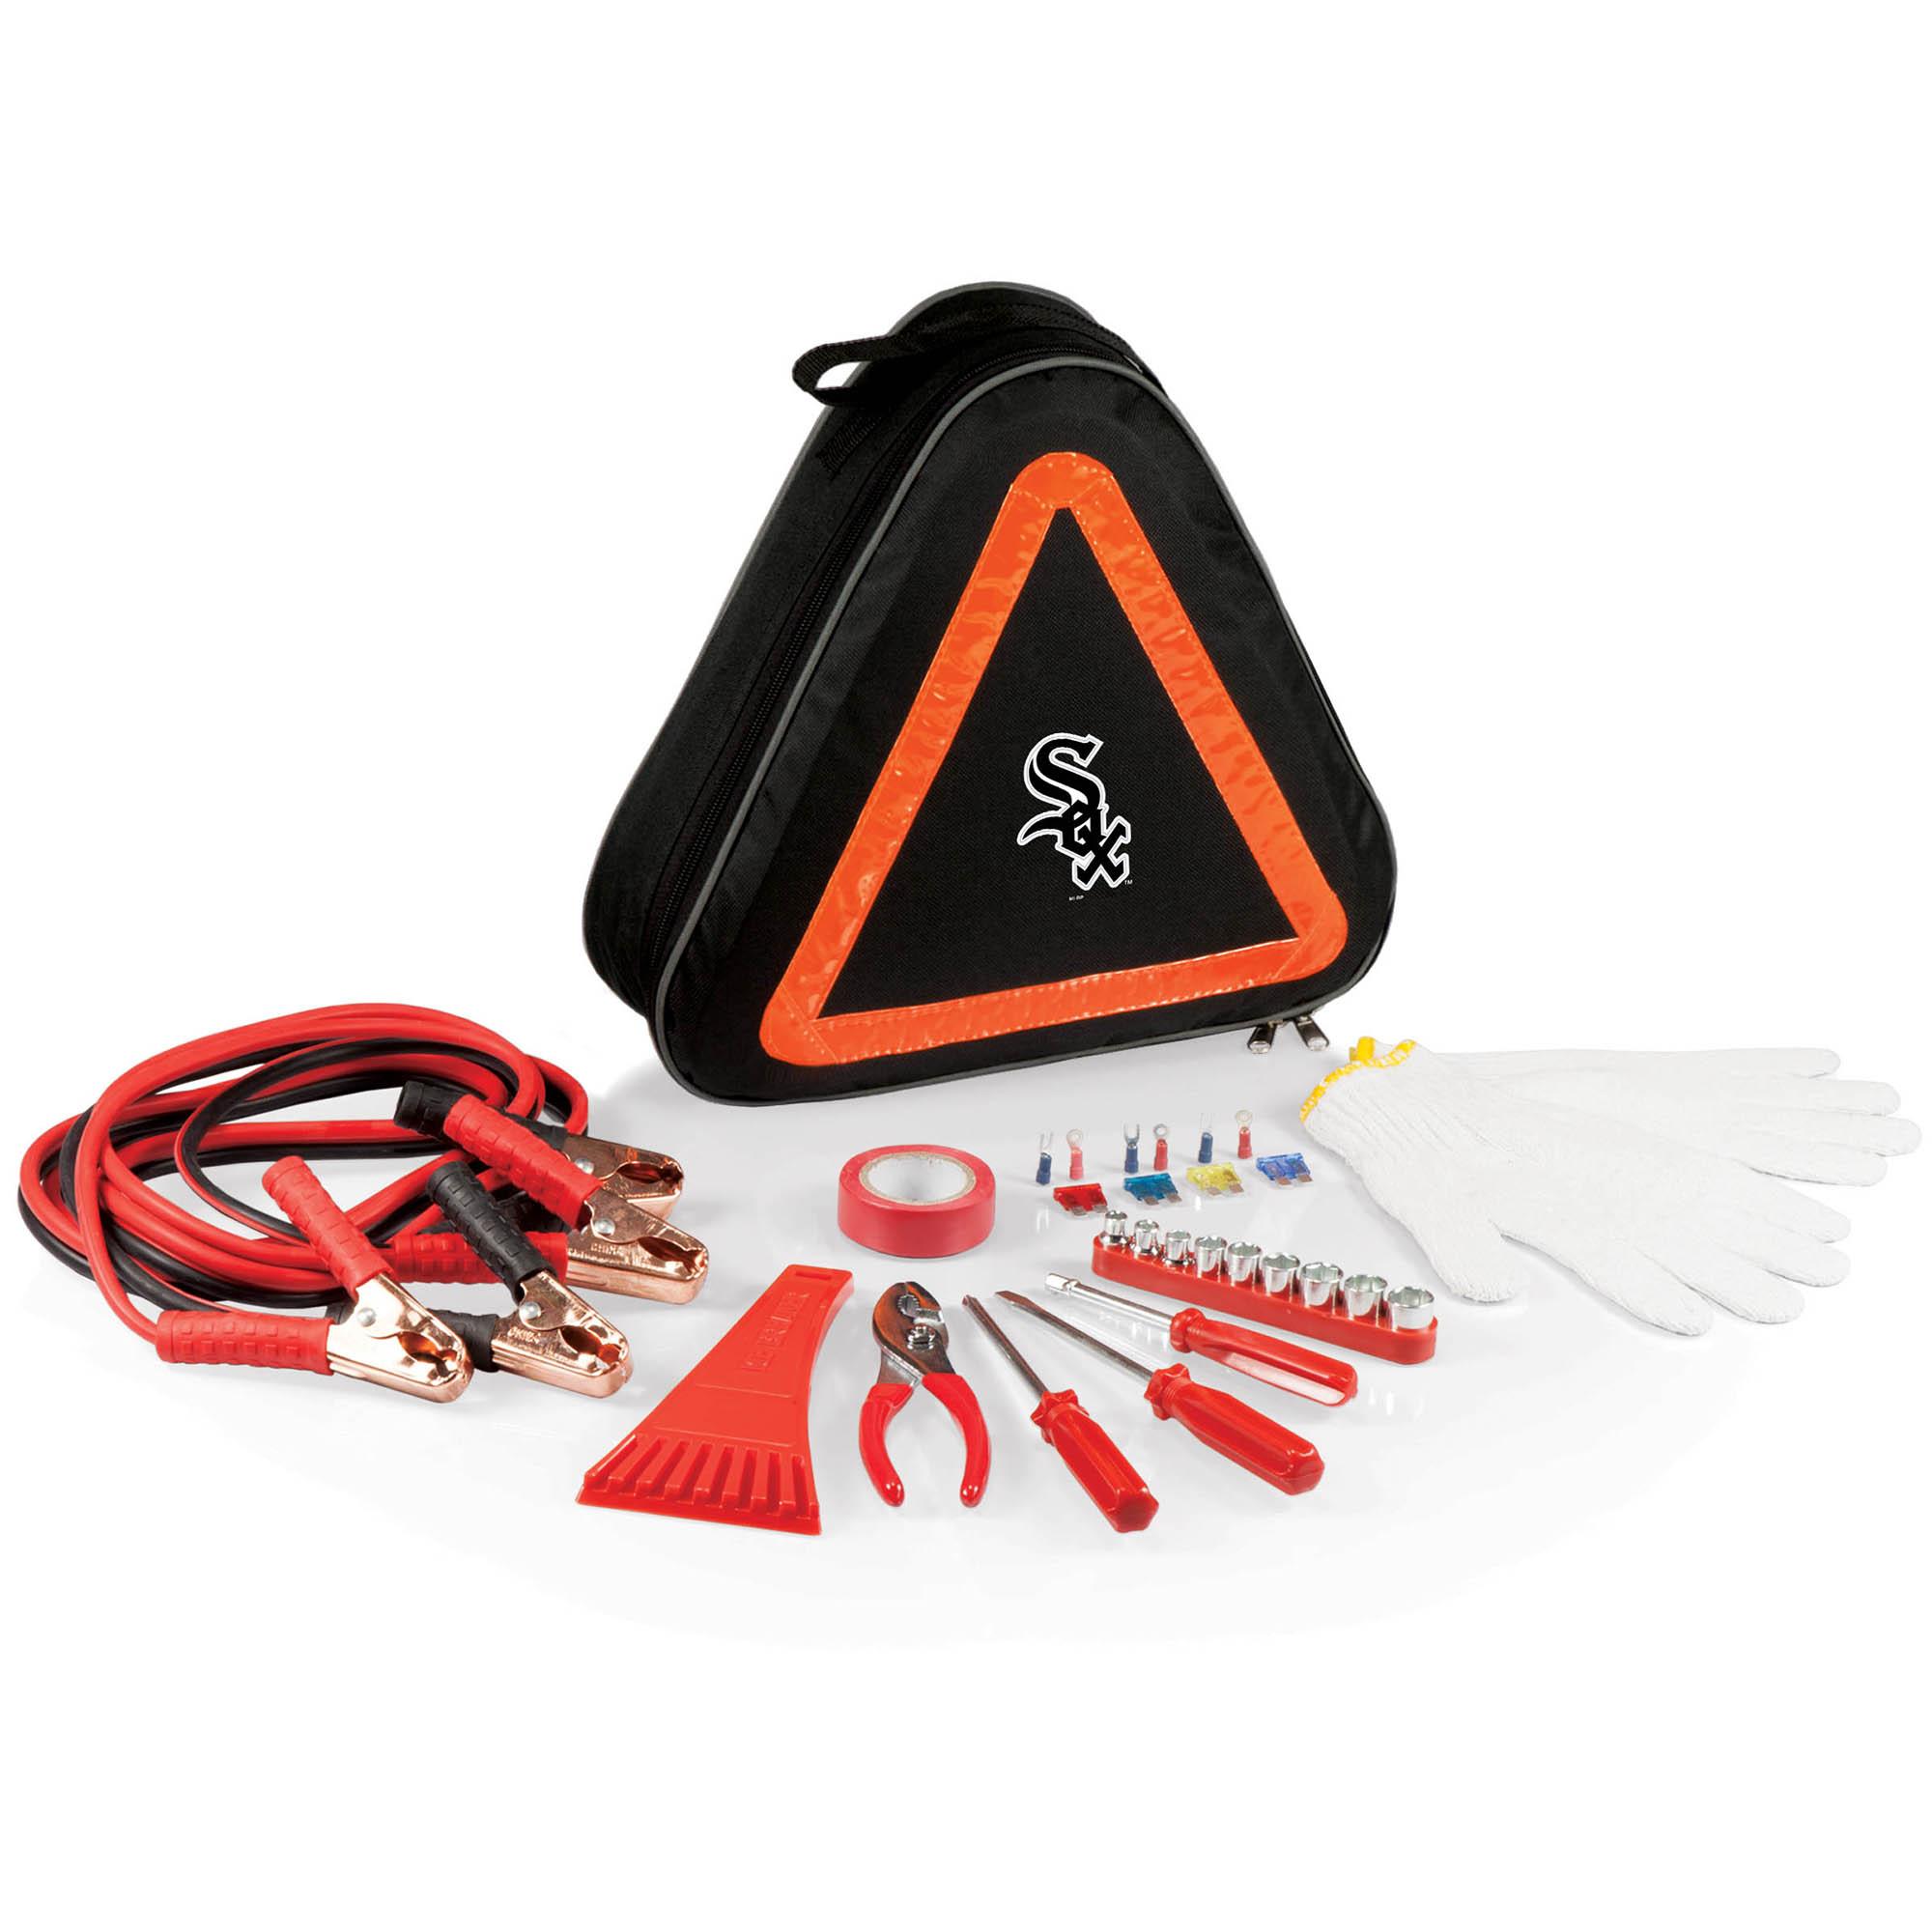 Chicago White Sox Roadside Emergency Kit - No Size